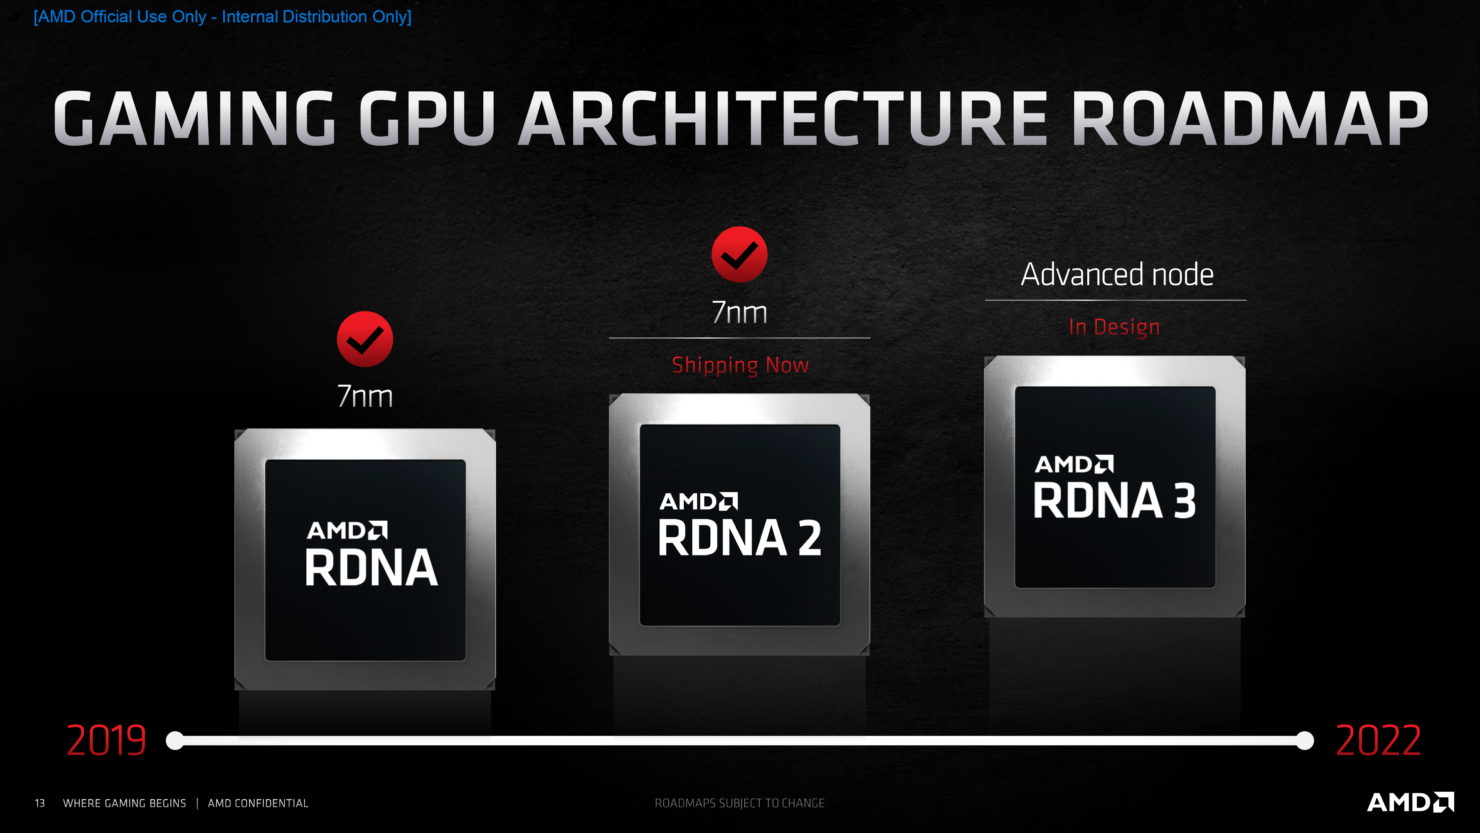 amd-radeon-rx-6000-series-graphics-cards_rdna-2-big-navi-gpu-architecture_10